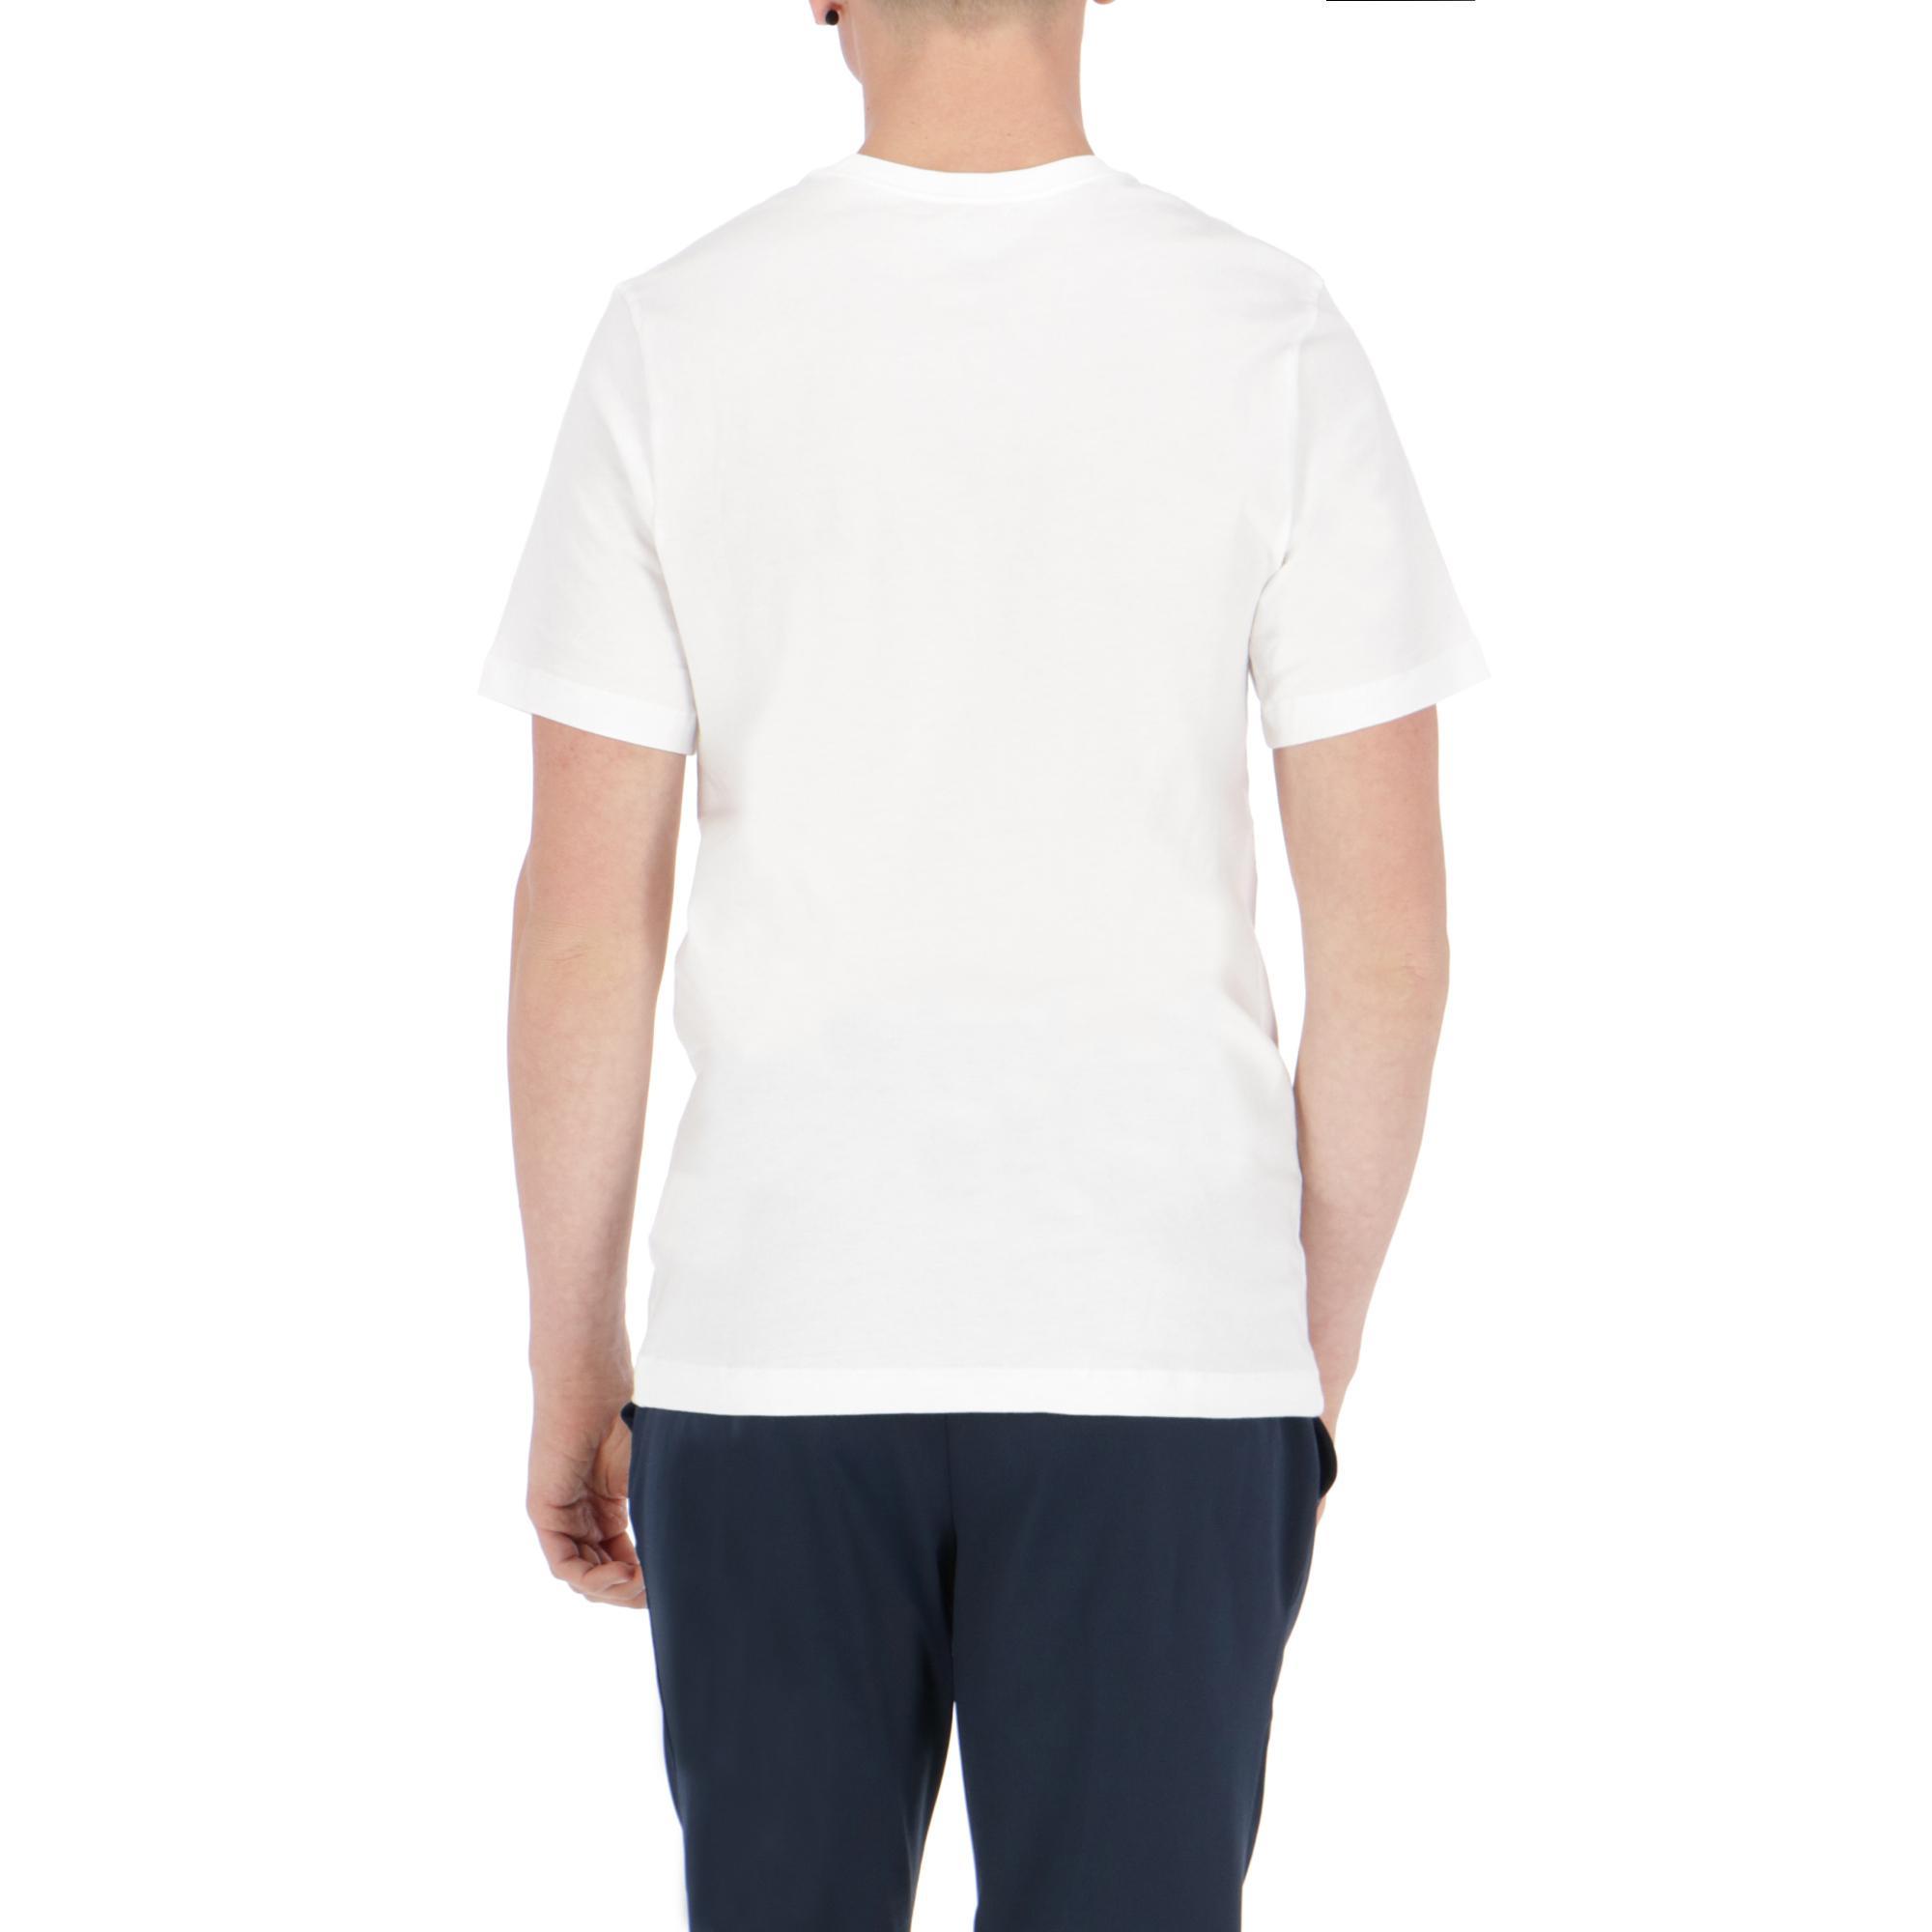 Nike Brand Mark Tee WHITE UNVRED